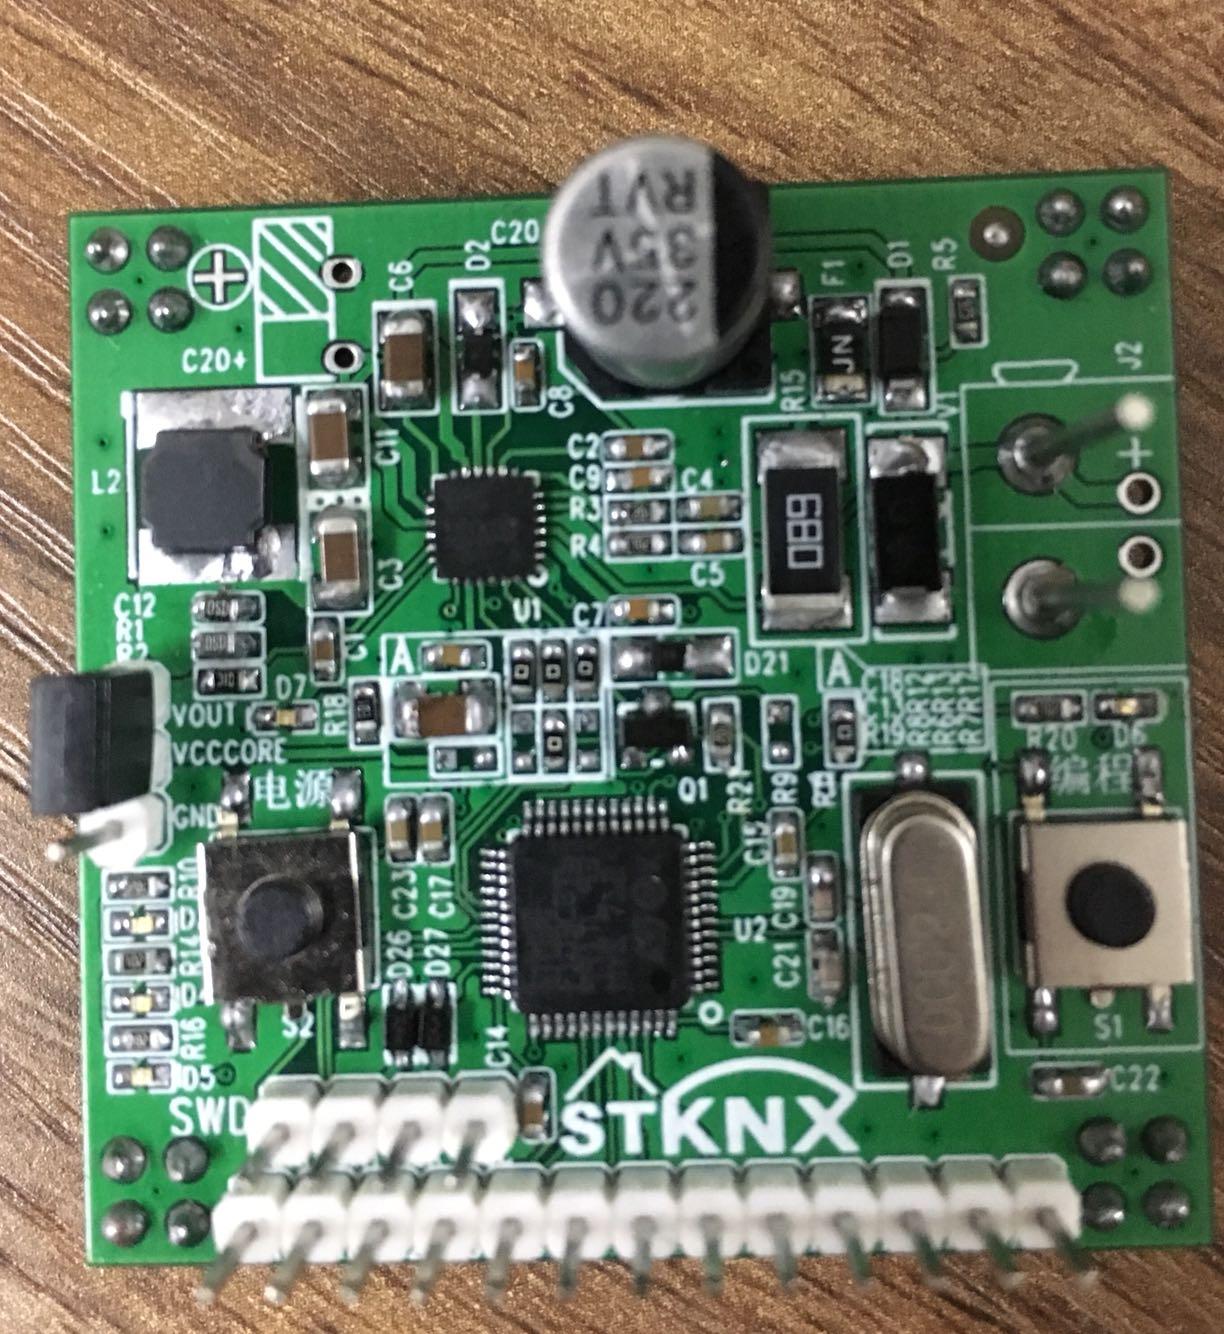 Placa de Teste Stknx